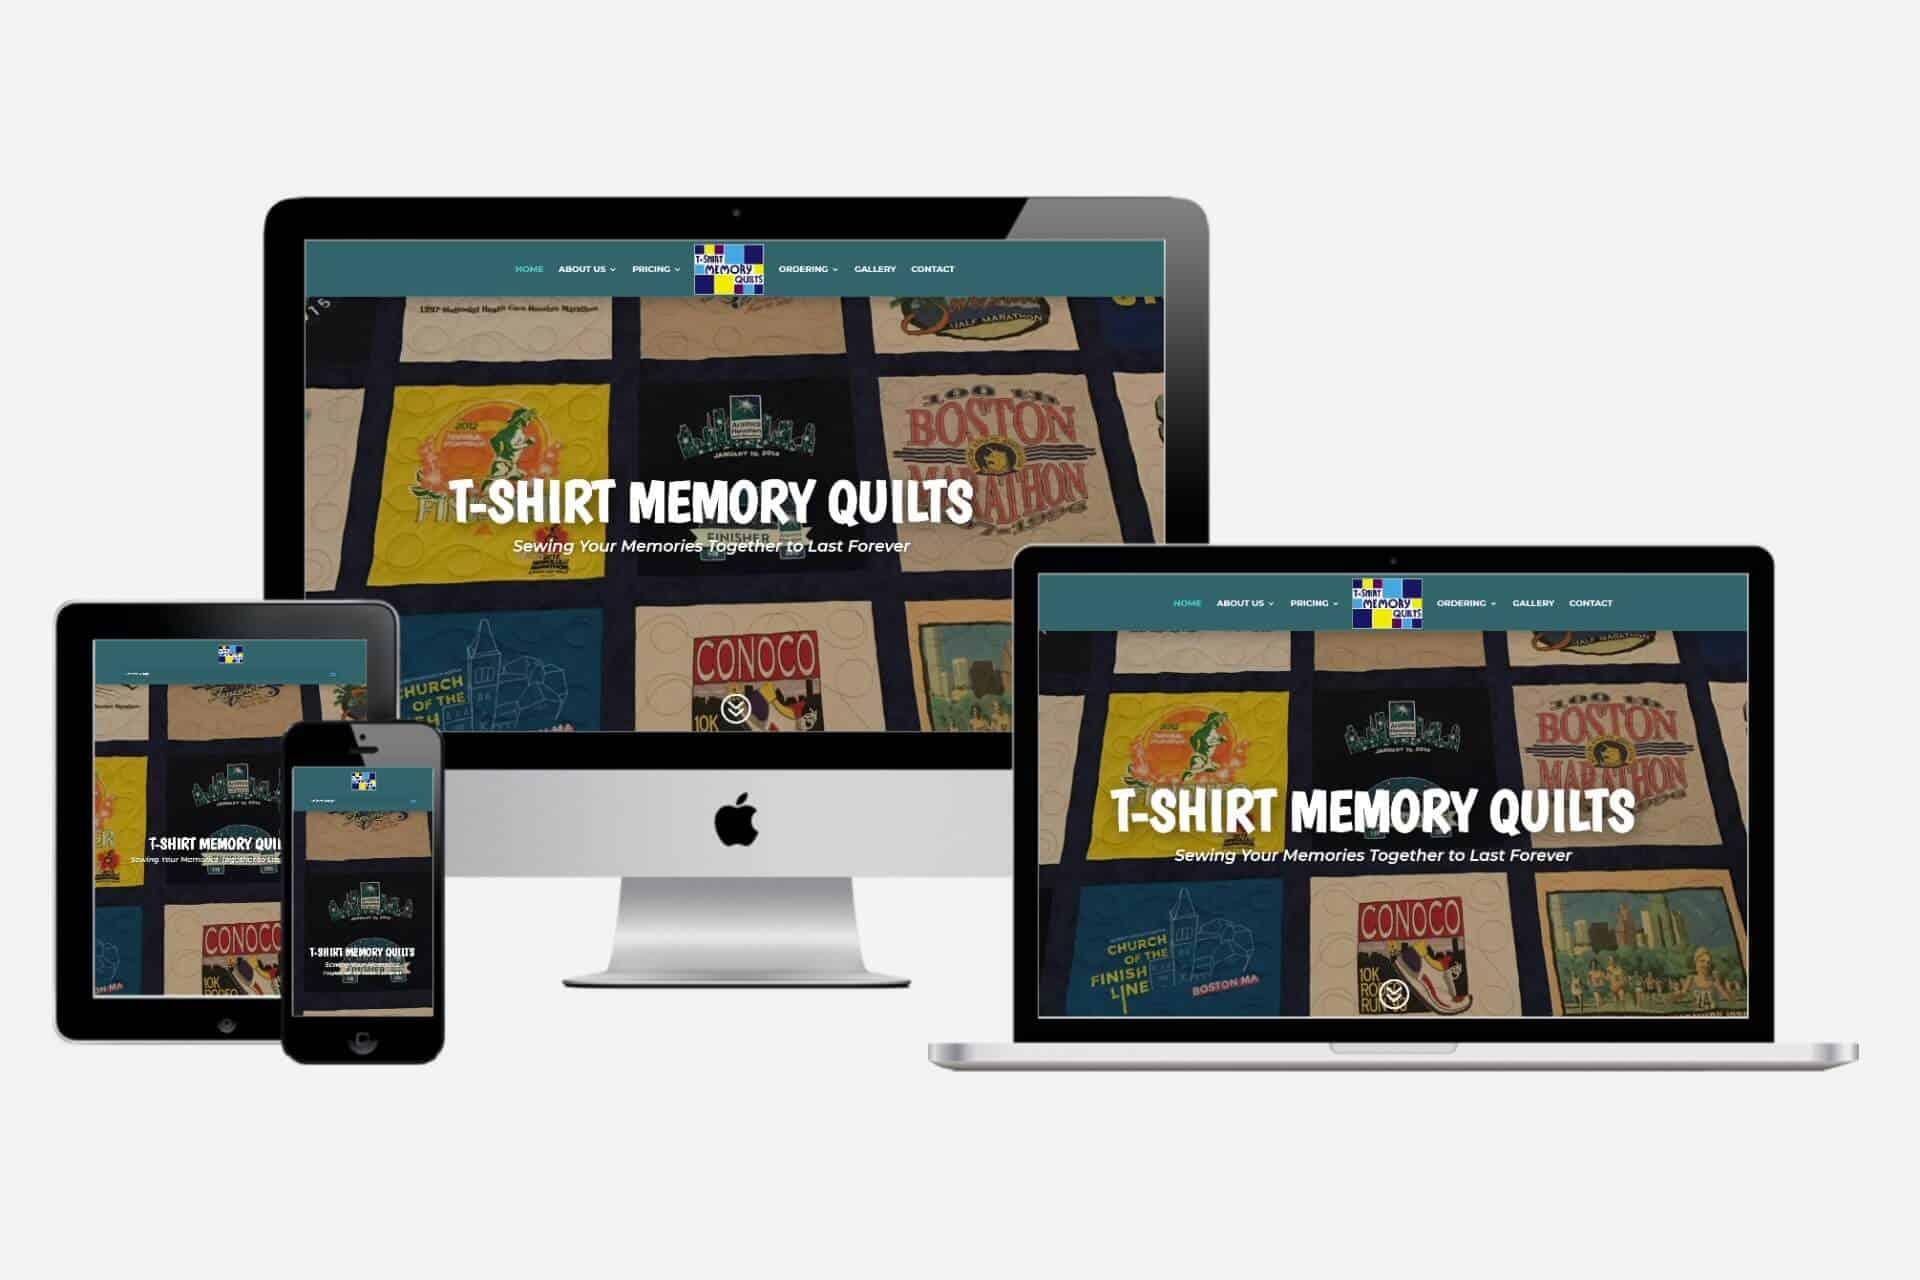 T-Shirt Memory Quilts Website Design by WizardsWebs Design LLC